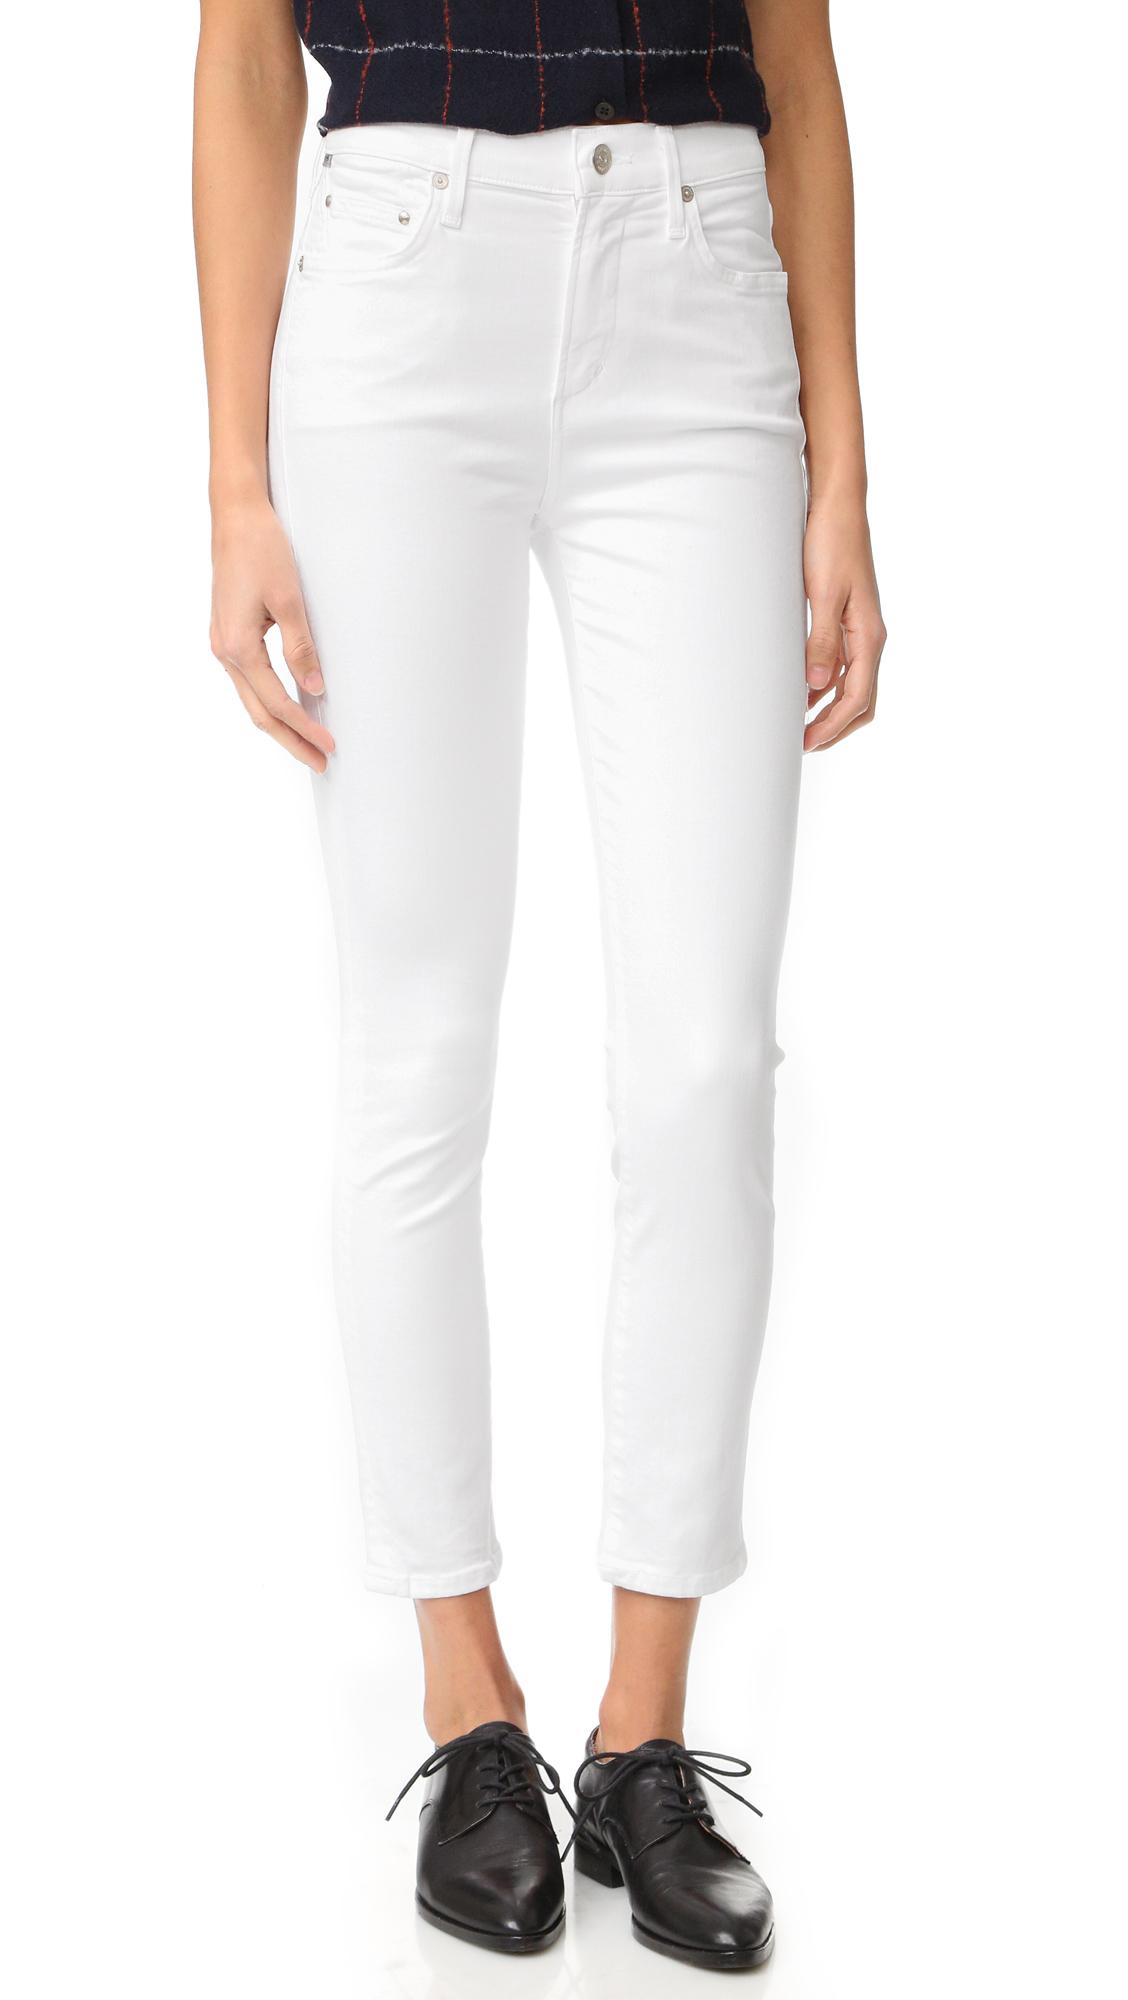 Citizens of Humanity Rocket Sculpt Crop Jeans - White